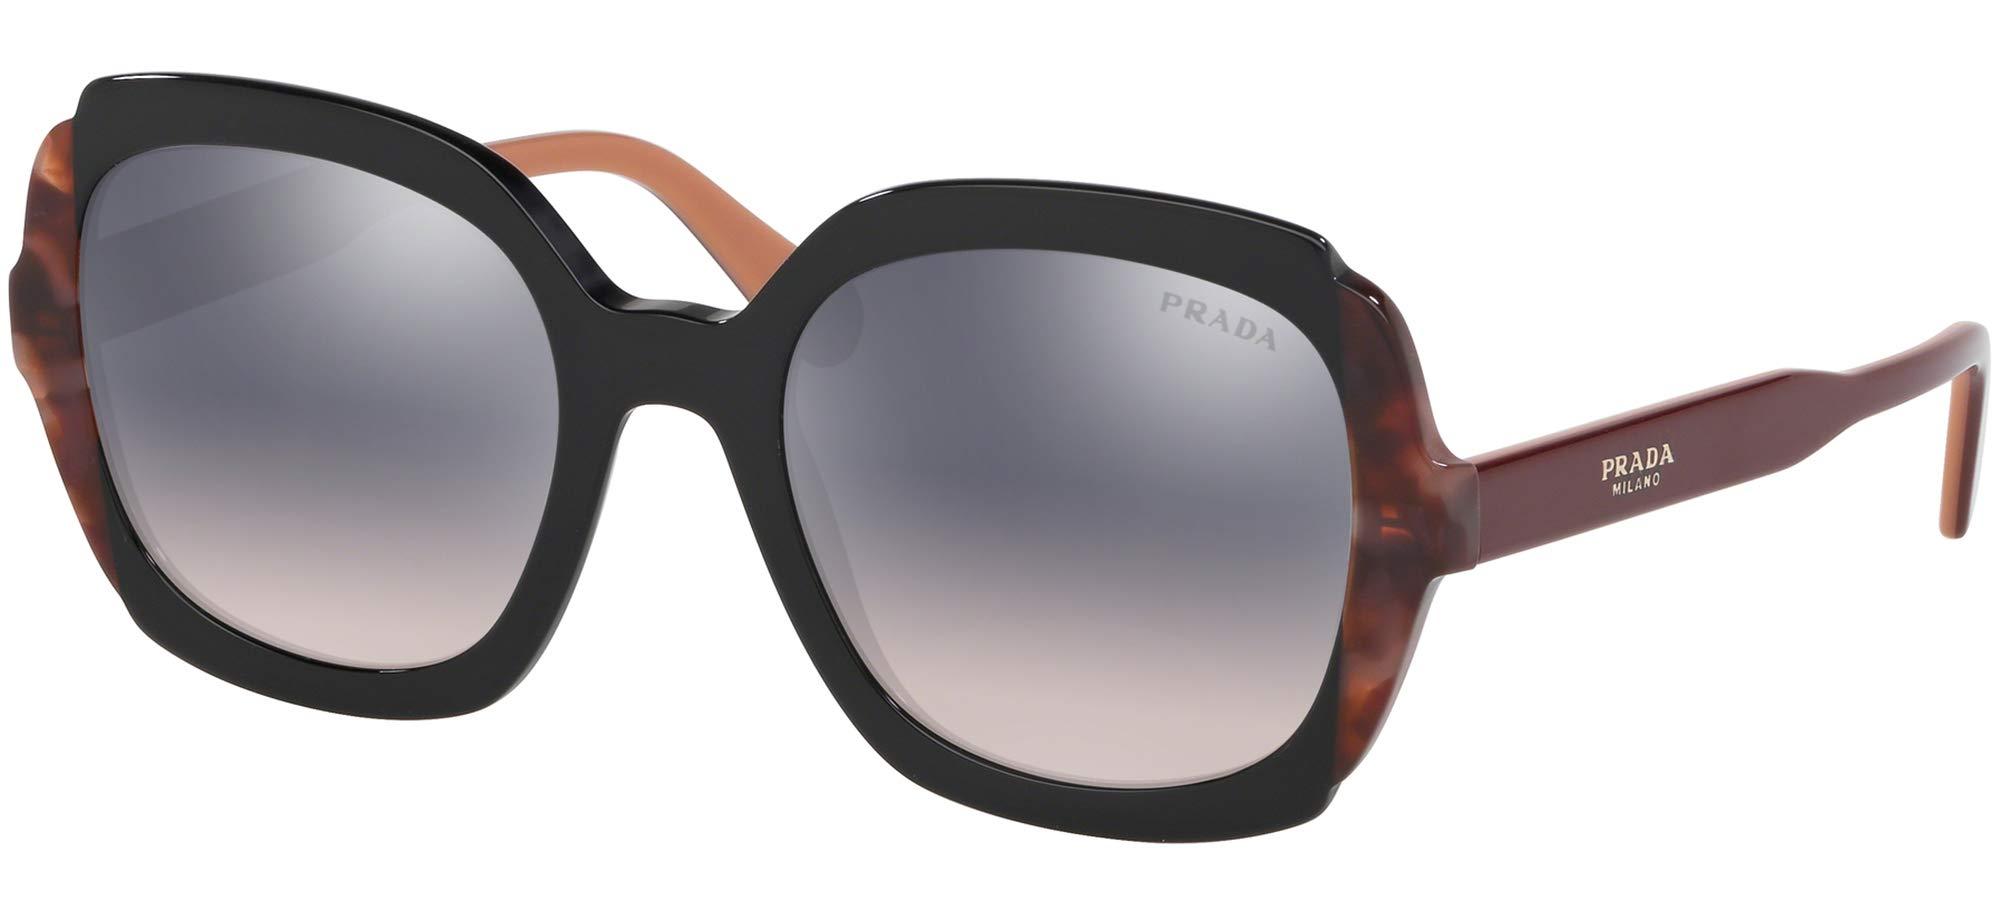 Prada Women's PR 16US Square Sunglasses, Black/Pink Havana, One Size by Prada